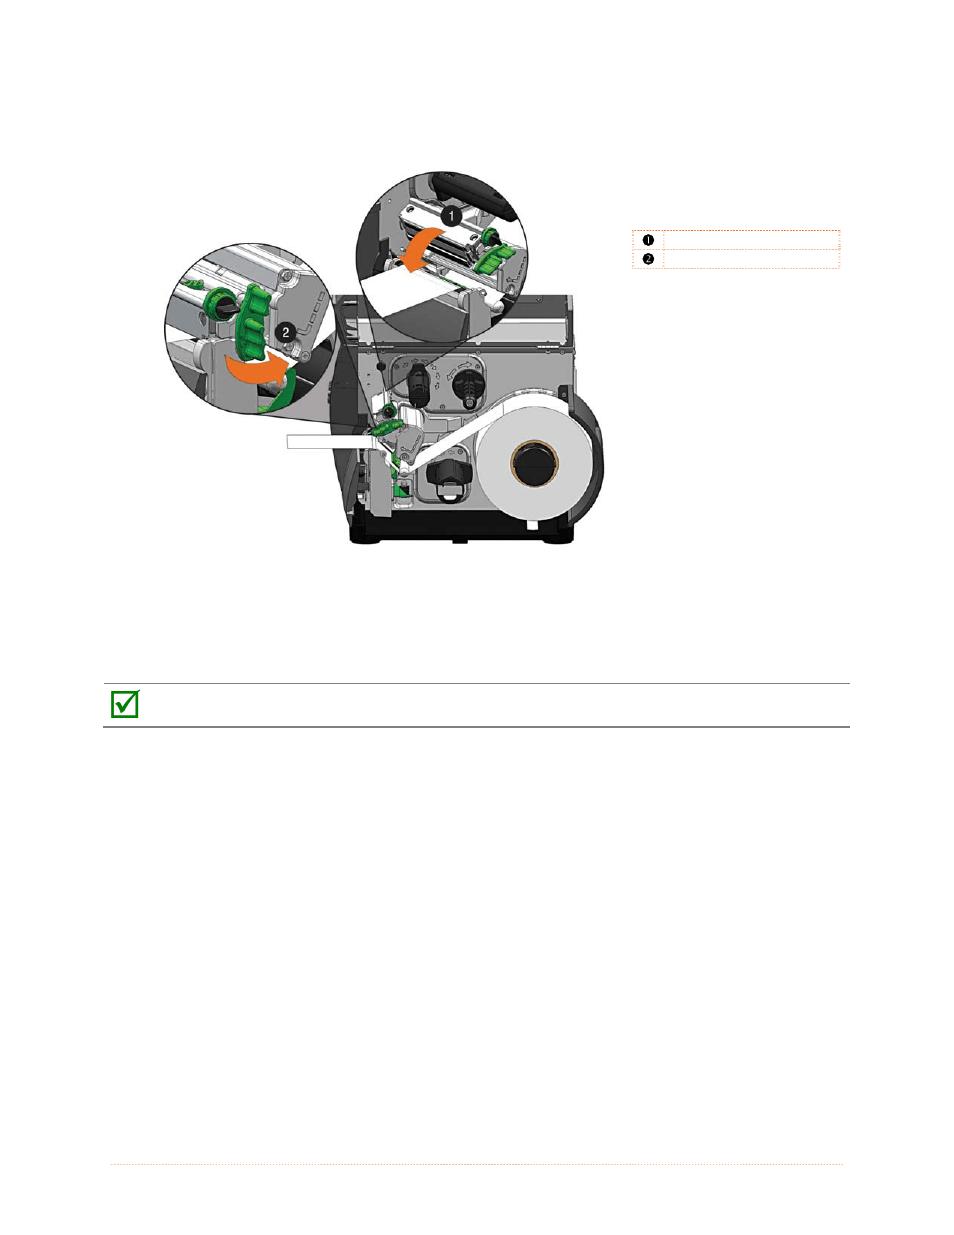 Datamax-O'Neil I-Class Mark II Operator's Manual User